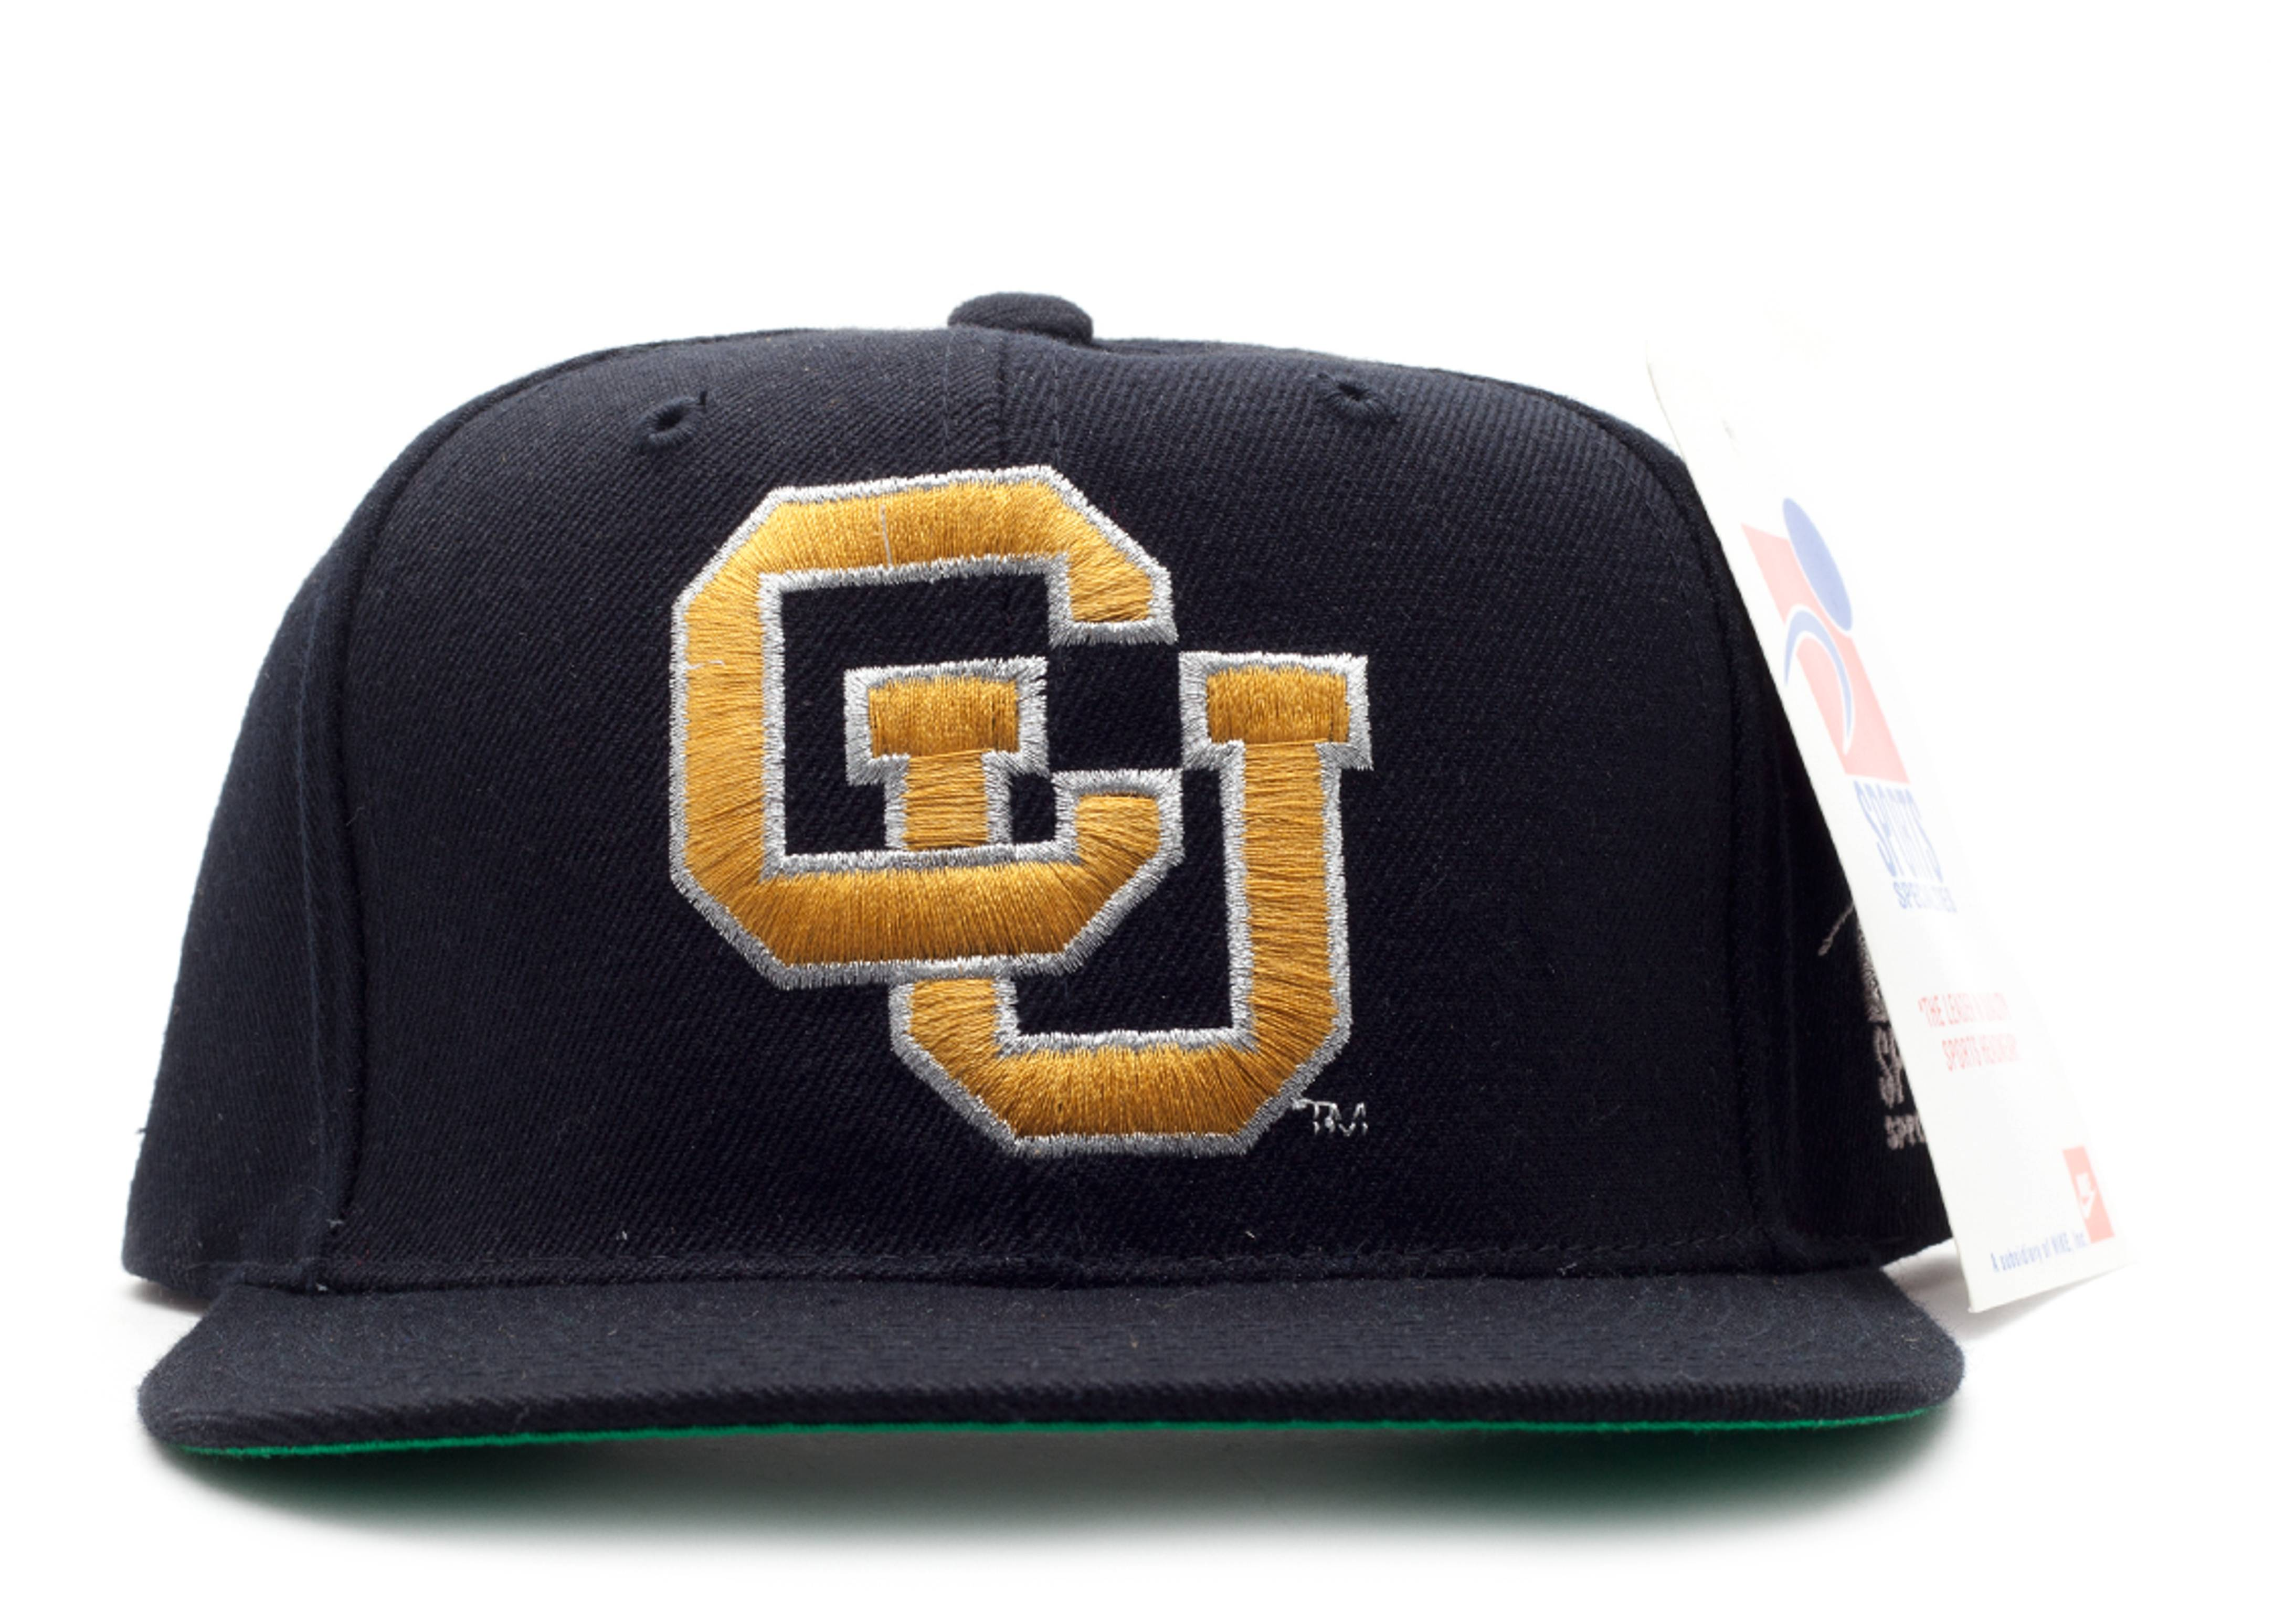 gonzaga university snap-back